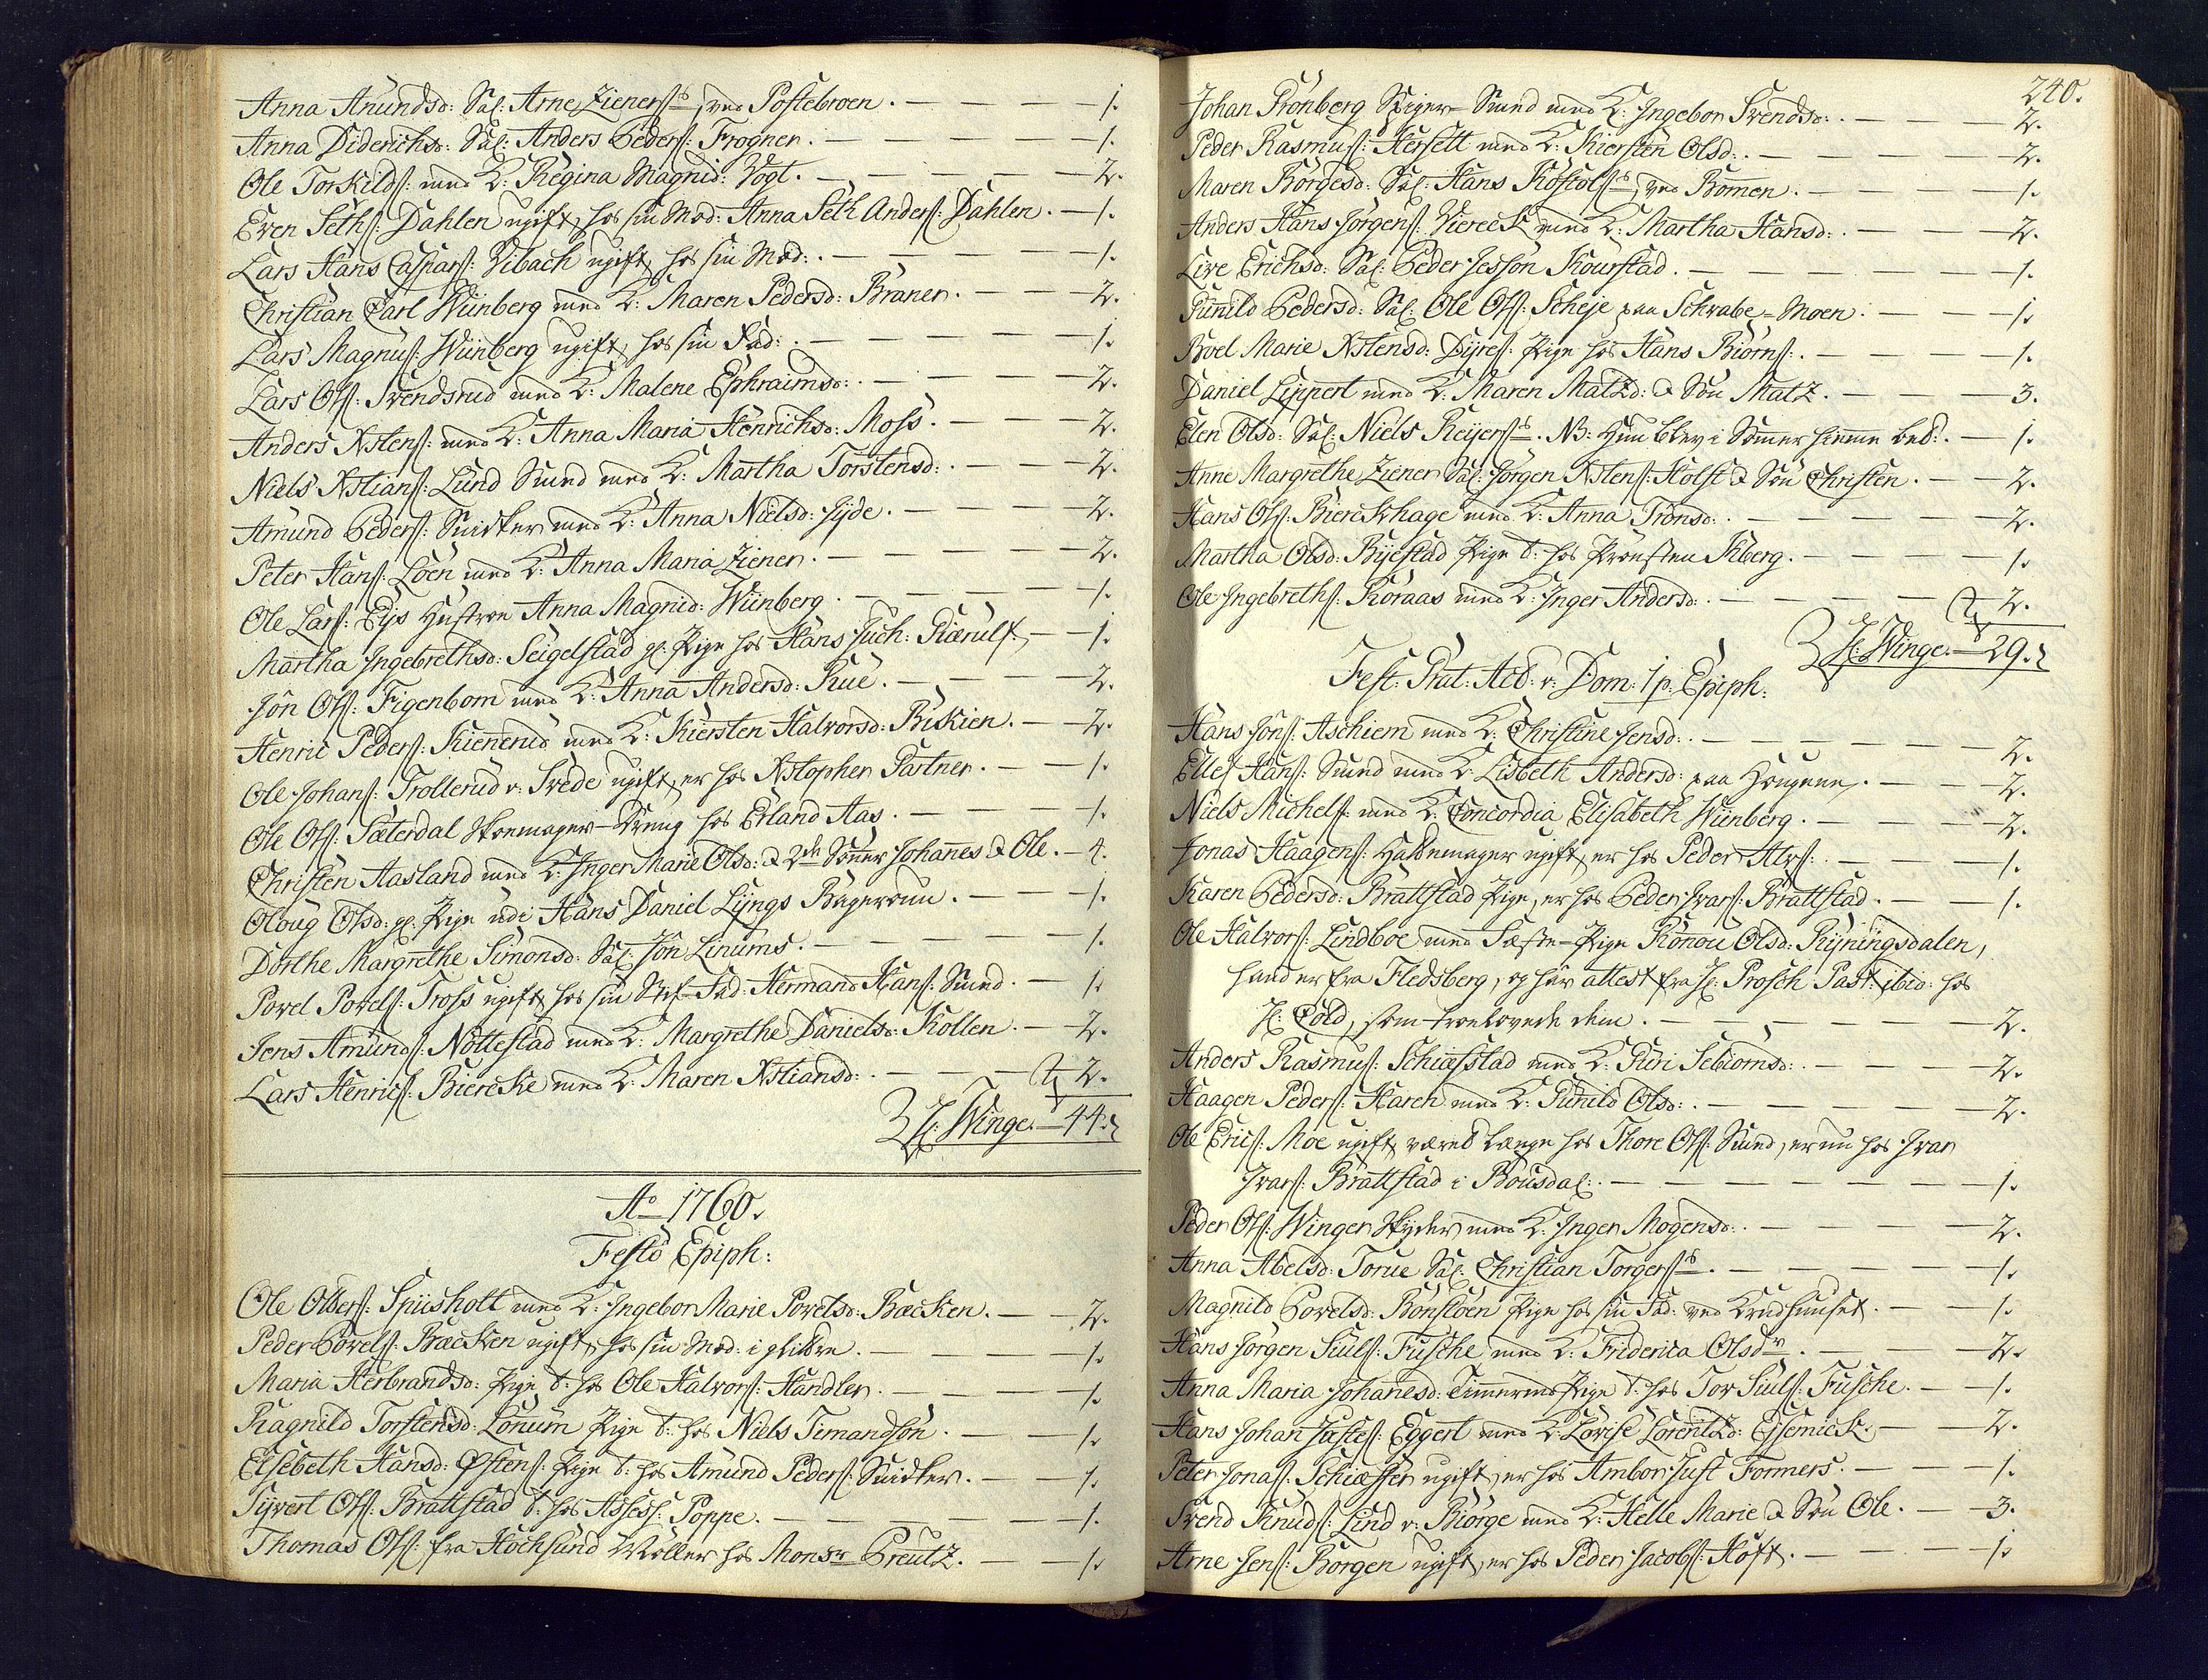 SAKO, Kongsberg kirkebøker, M/Ma/L0005: Kommunikantprotokoll nr. 5, 1755-1761, s. 240